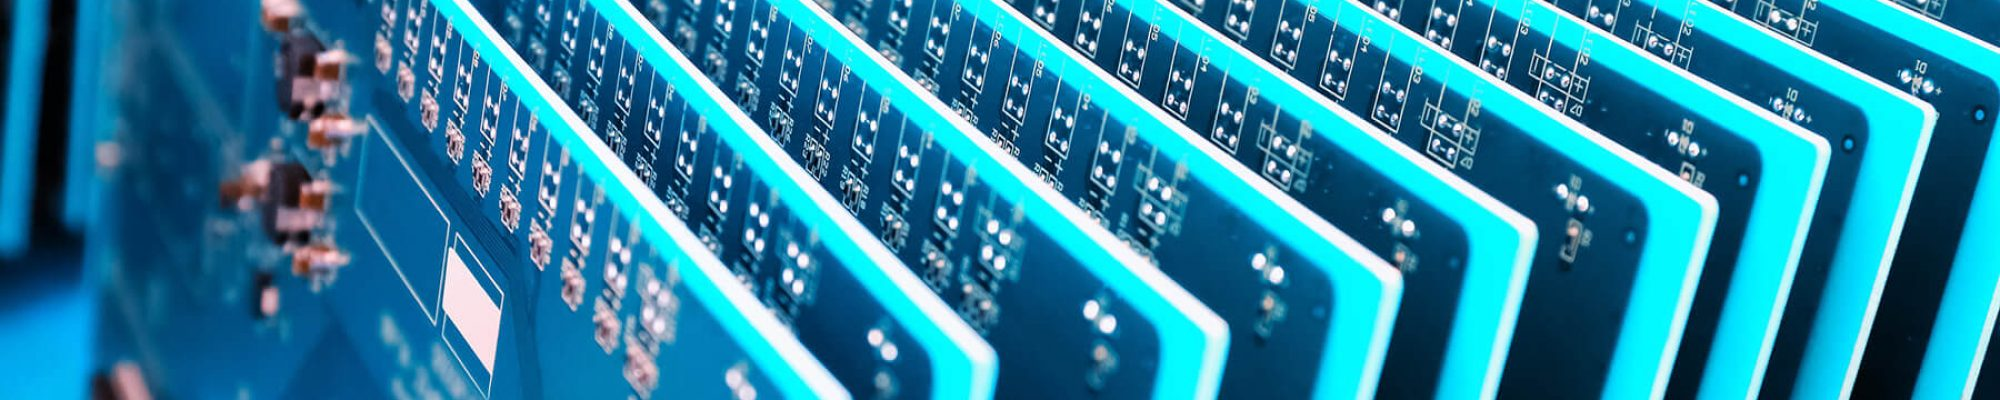 communication-circuit-board-closeup-P3QEBMC-1